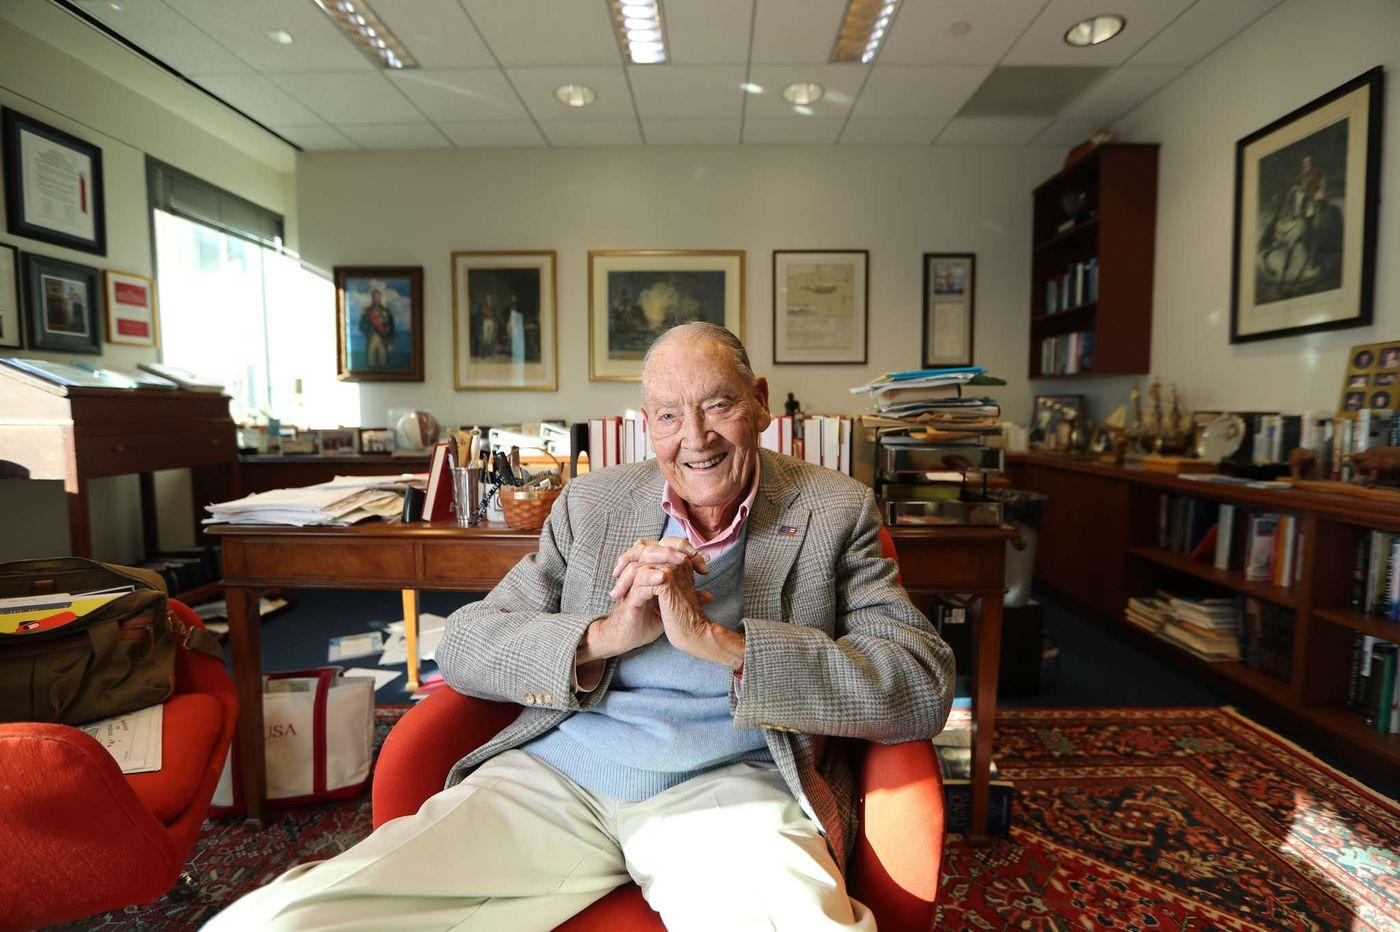 John C. Bogle, founder of Vanguard, dies at 89